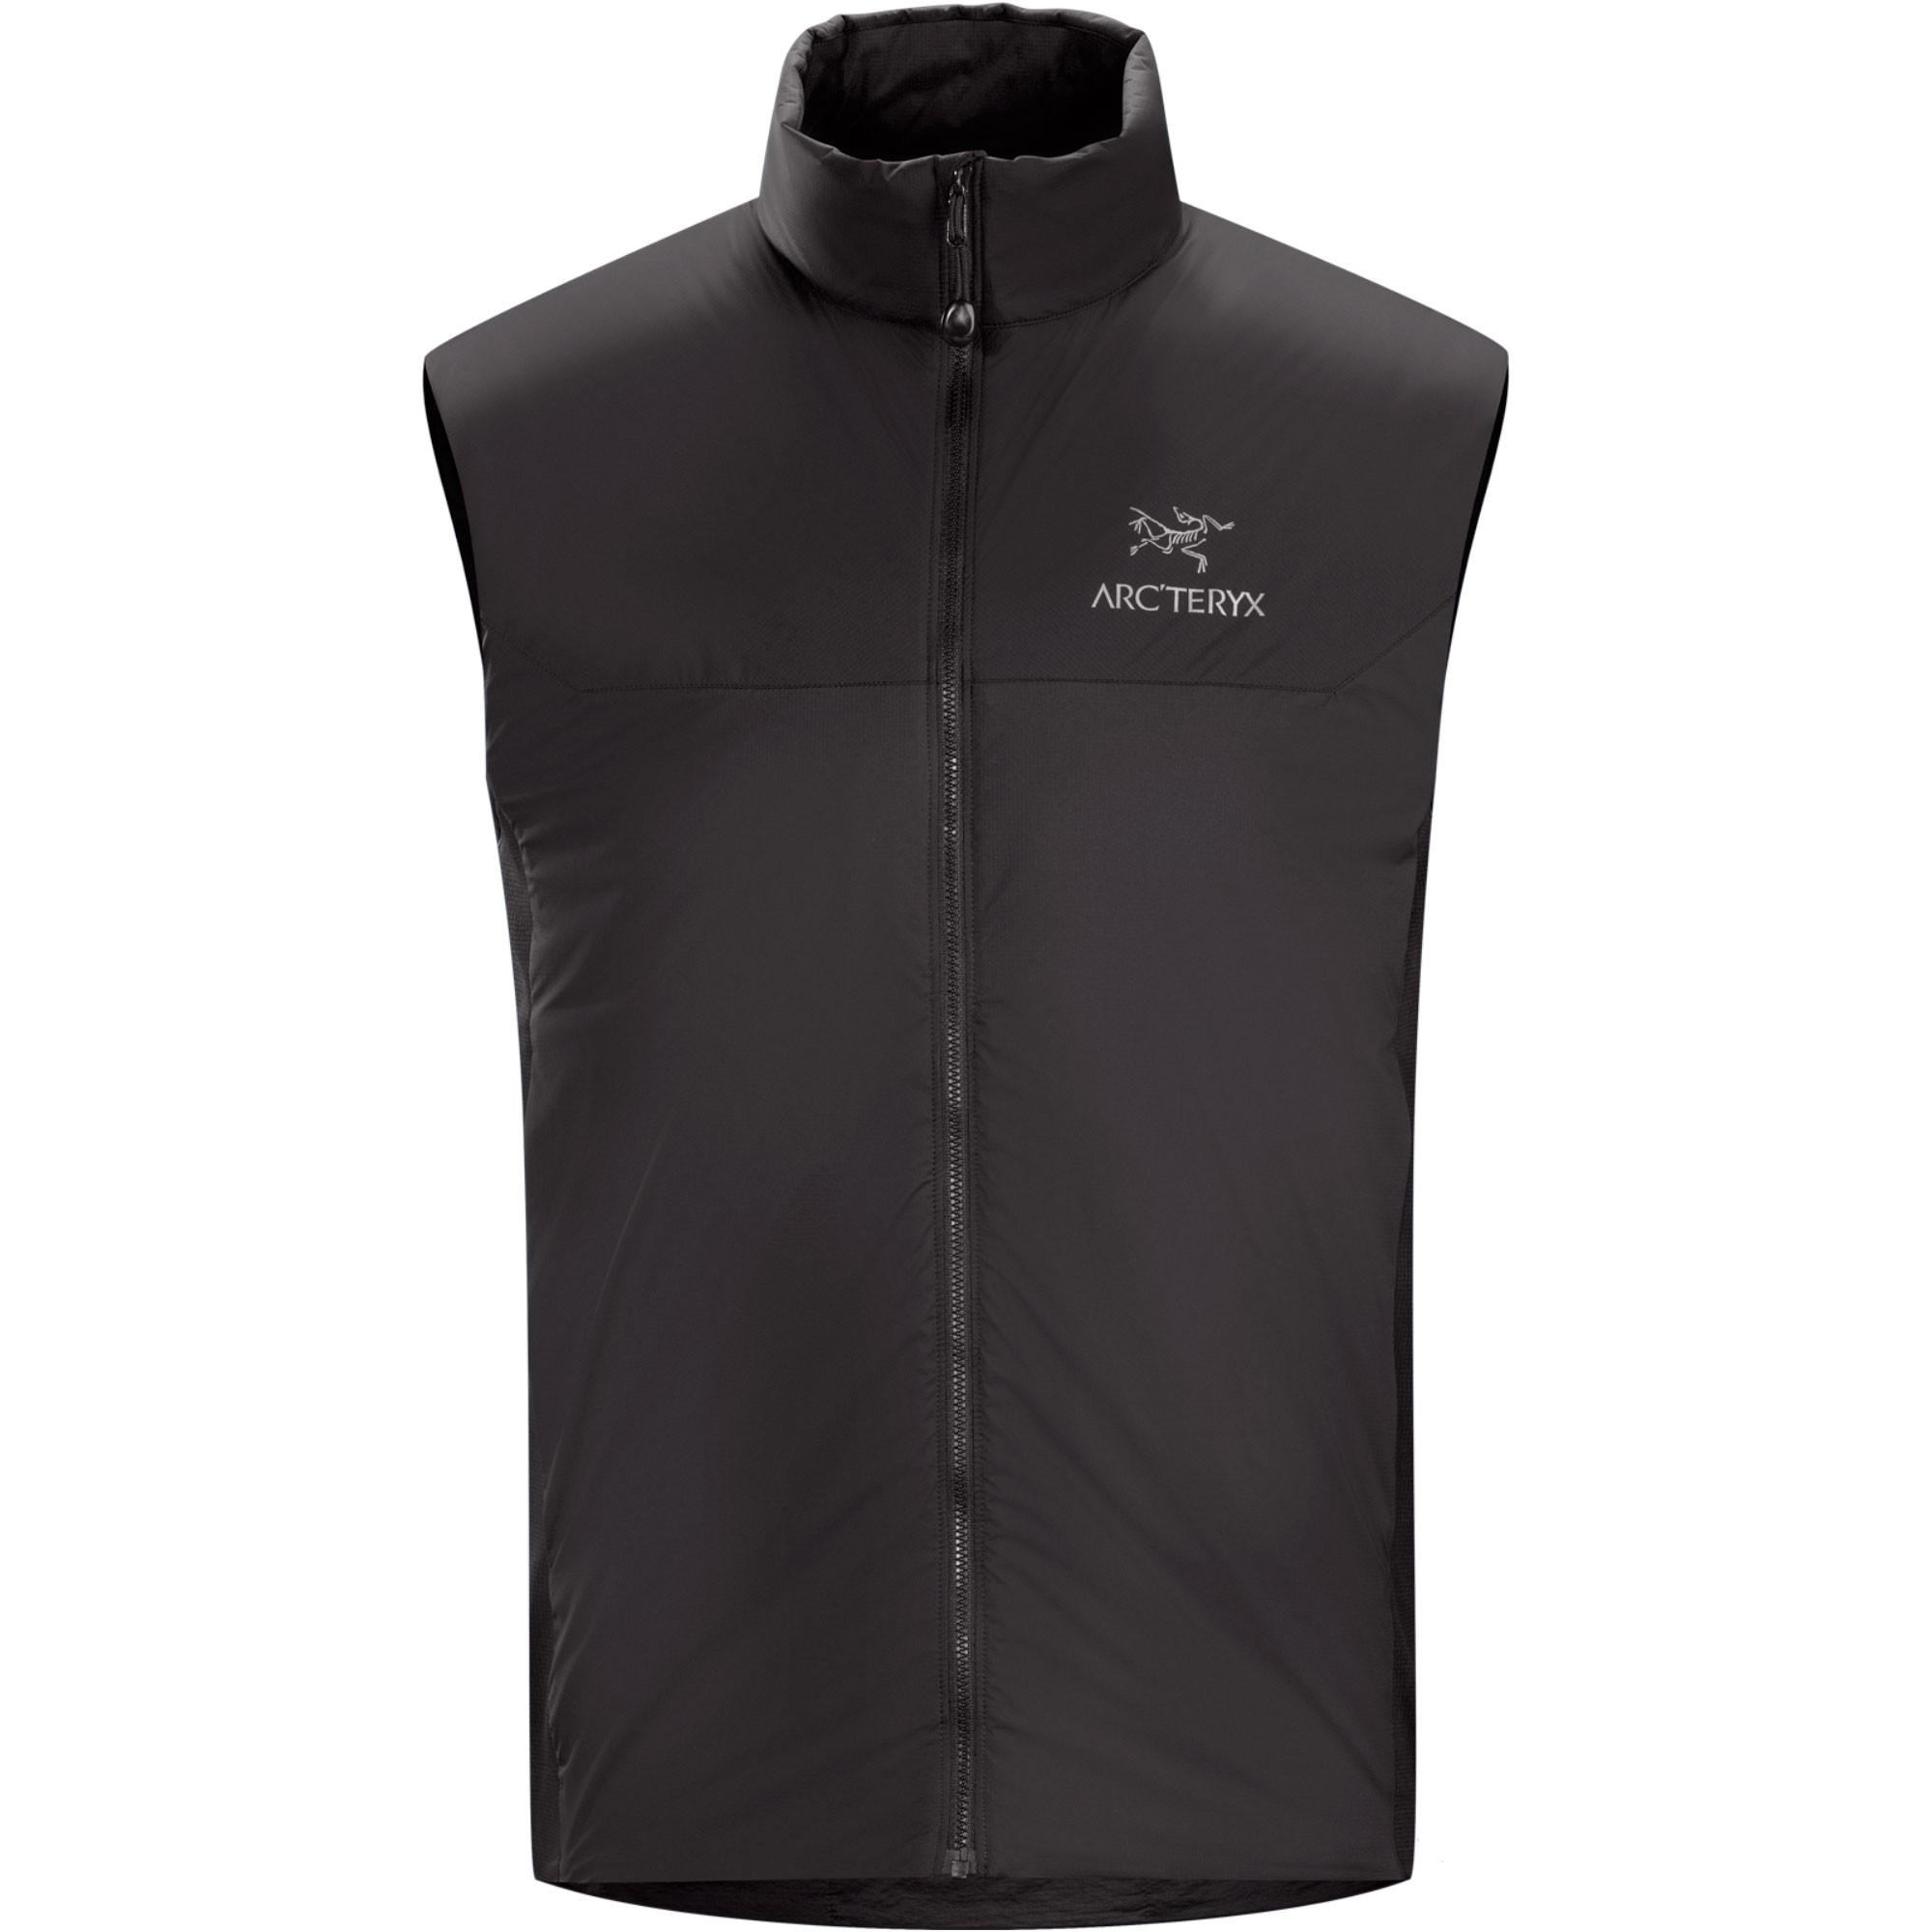 ARCTERYX - Atom LT Vest